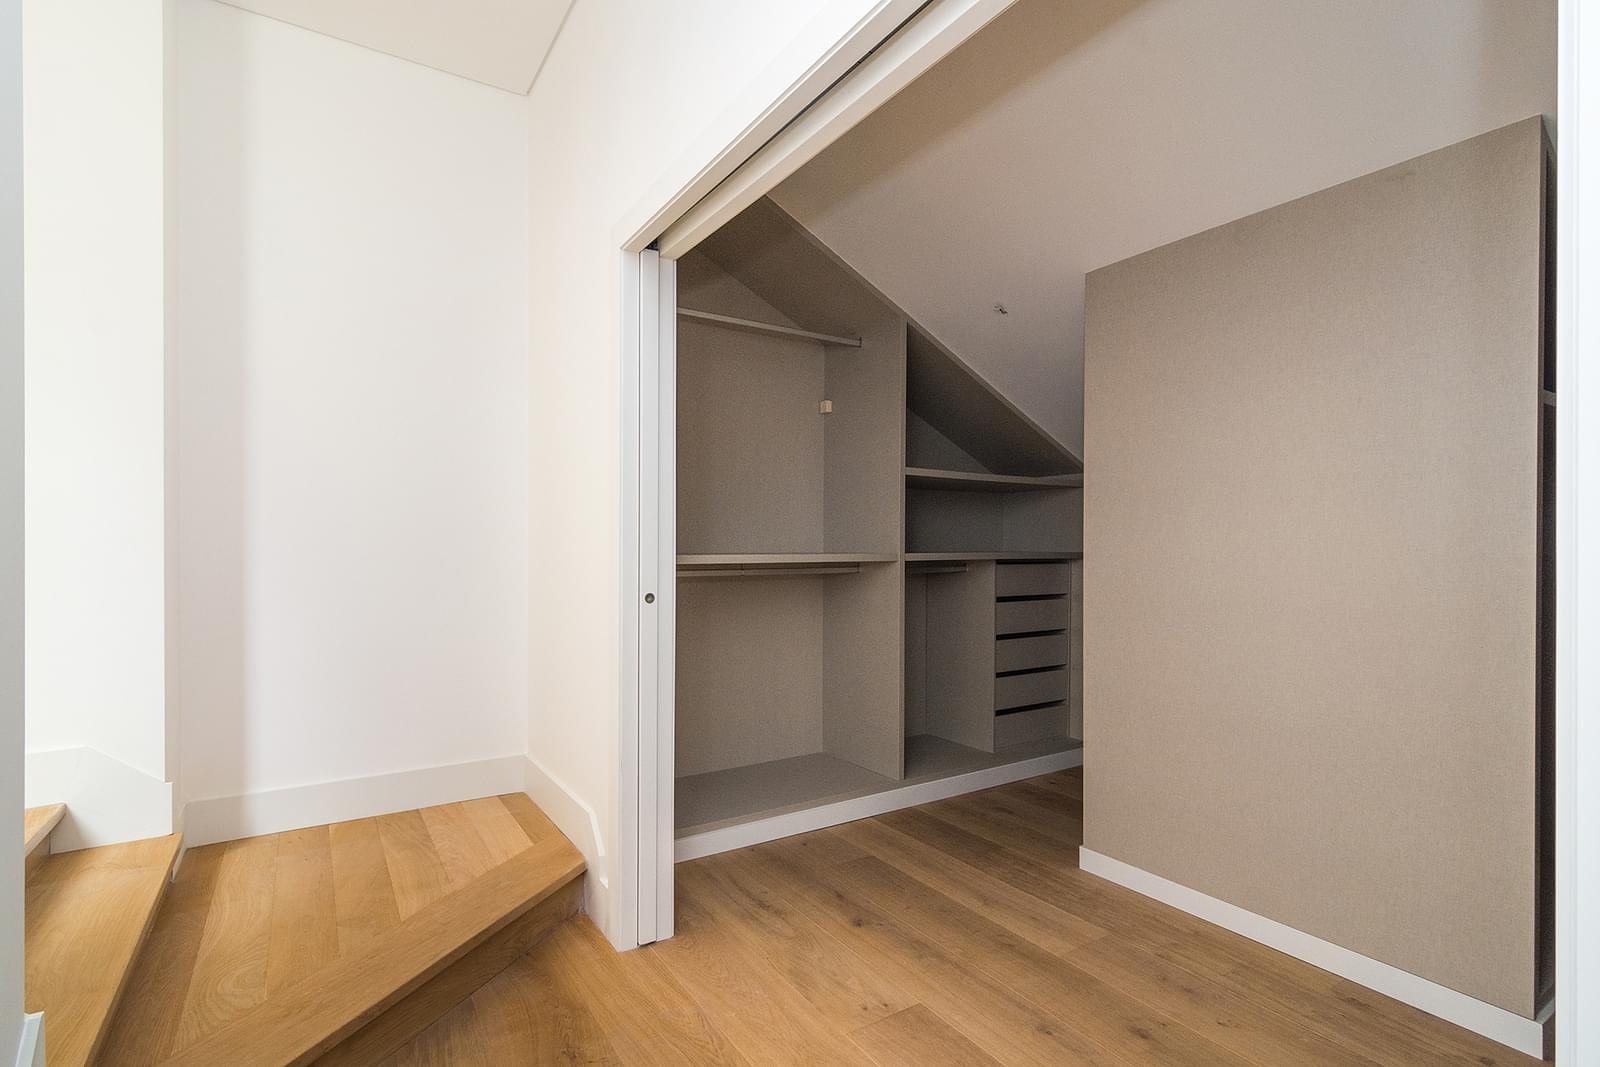 pf16887-apartamento-t5-lisboa-1f43cdd4-3667-41f7-824b-9d5a5e98ead2